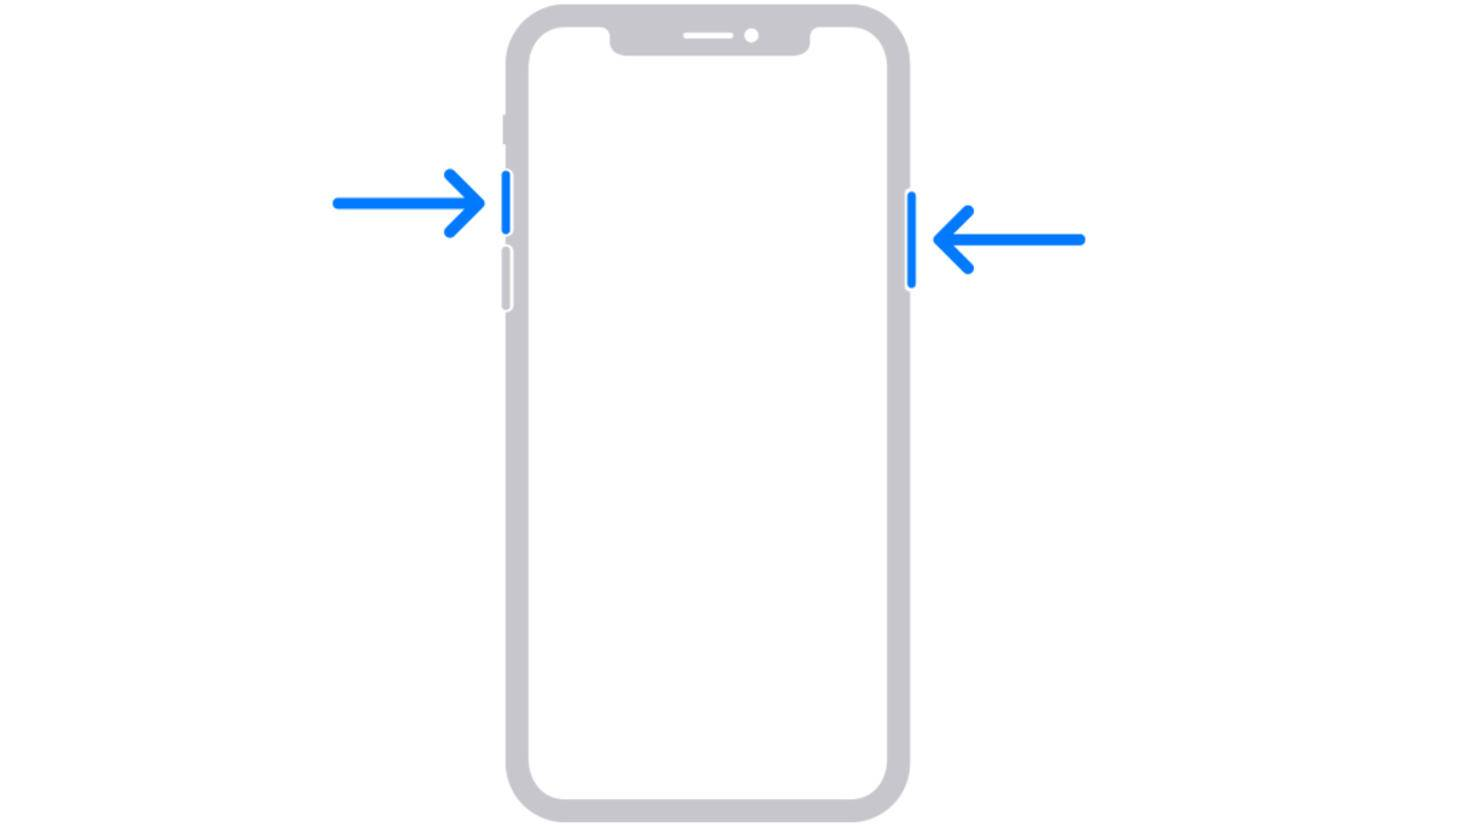 iPhone ohne Home-Button Screenshot